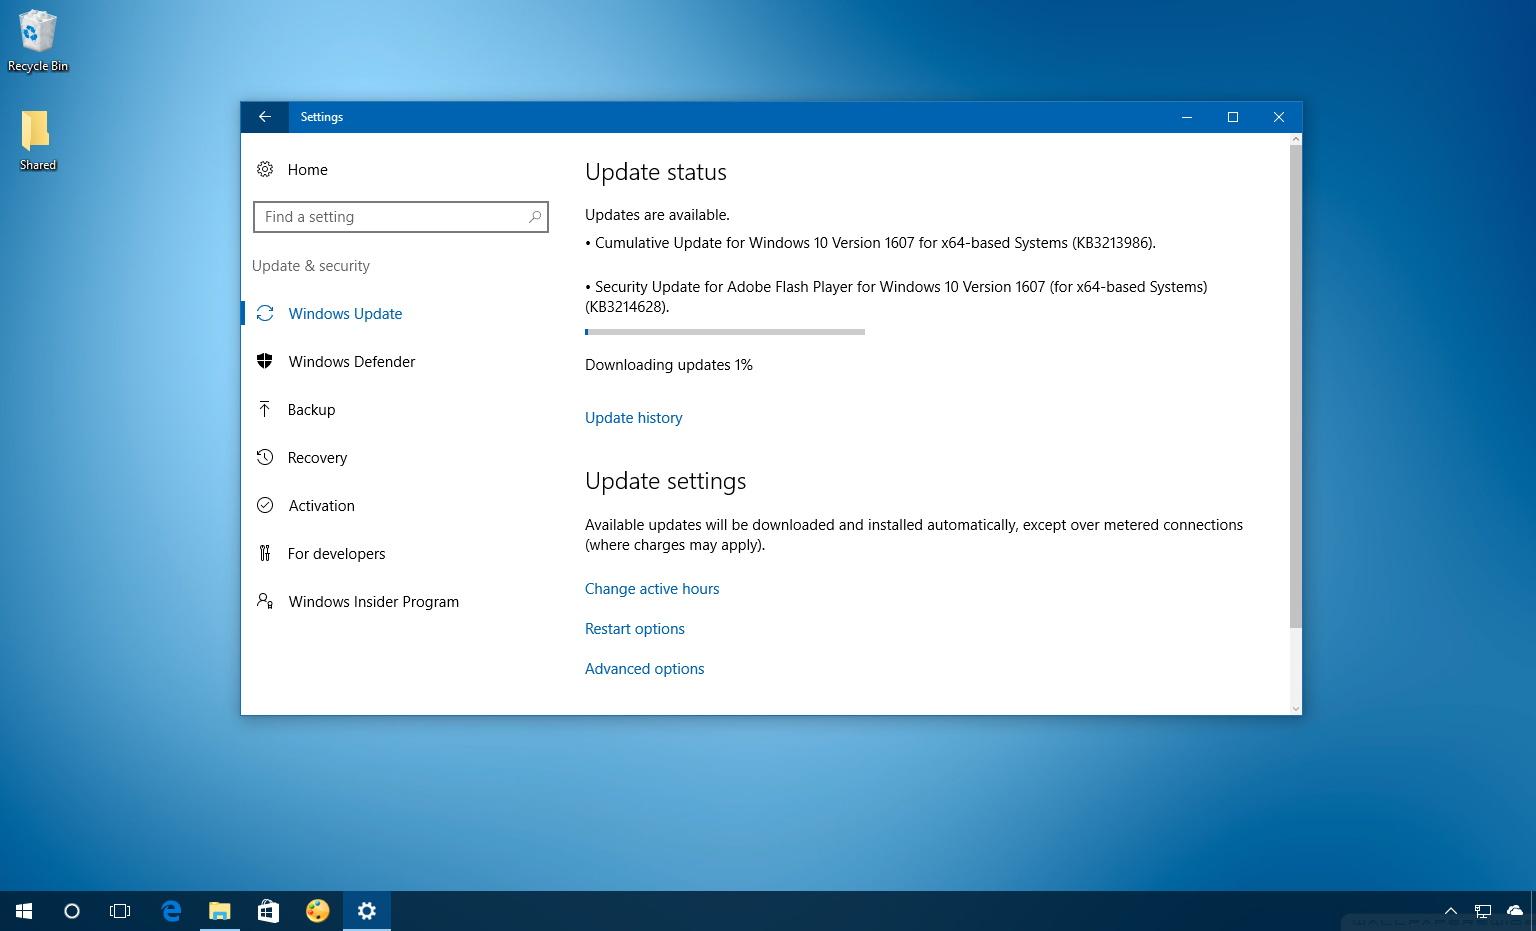 Windows 10 KB3213986